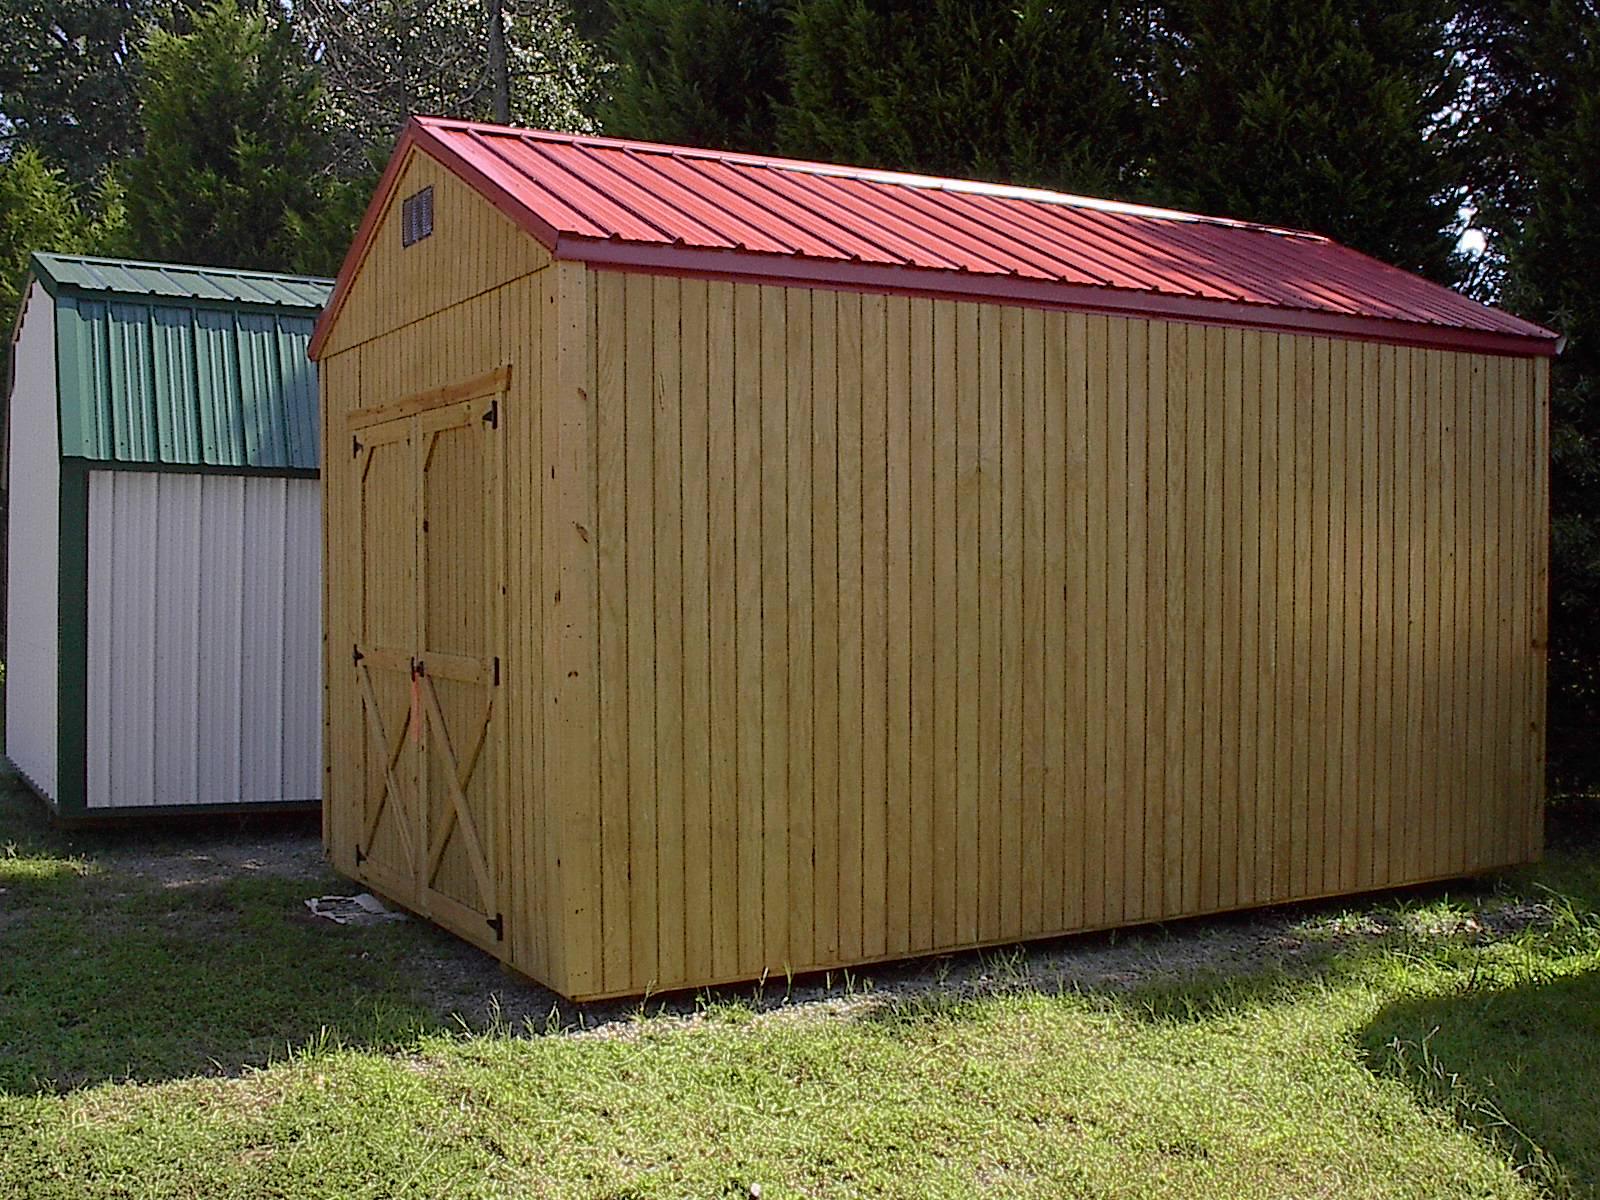 New - Rent To Own Wooden Storage Buildings In Nc | bunda-daffa.com